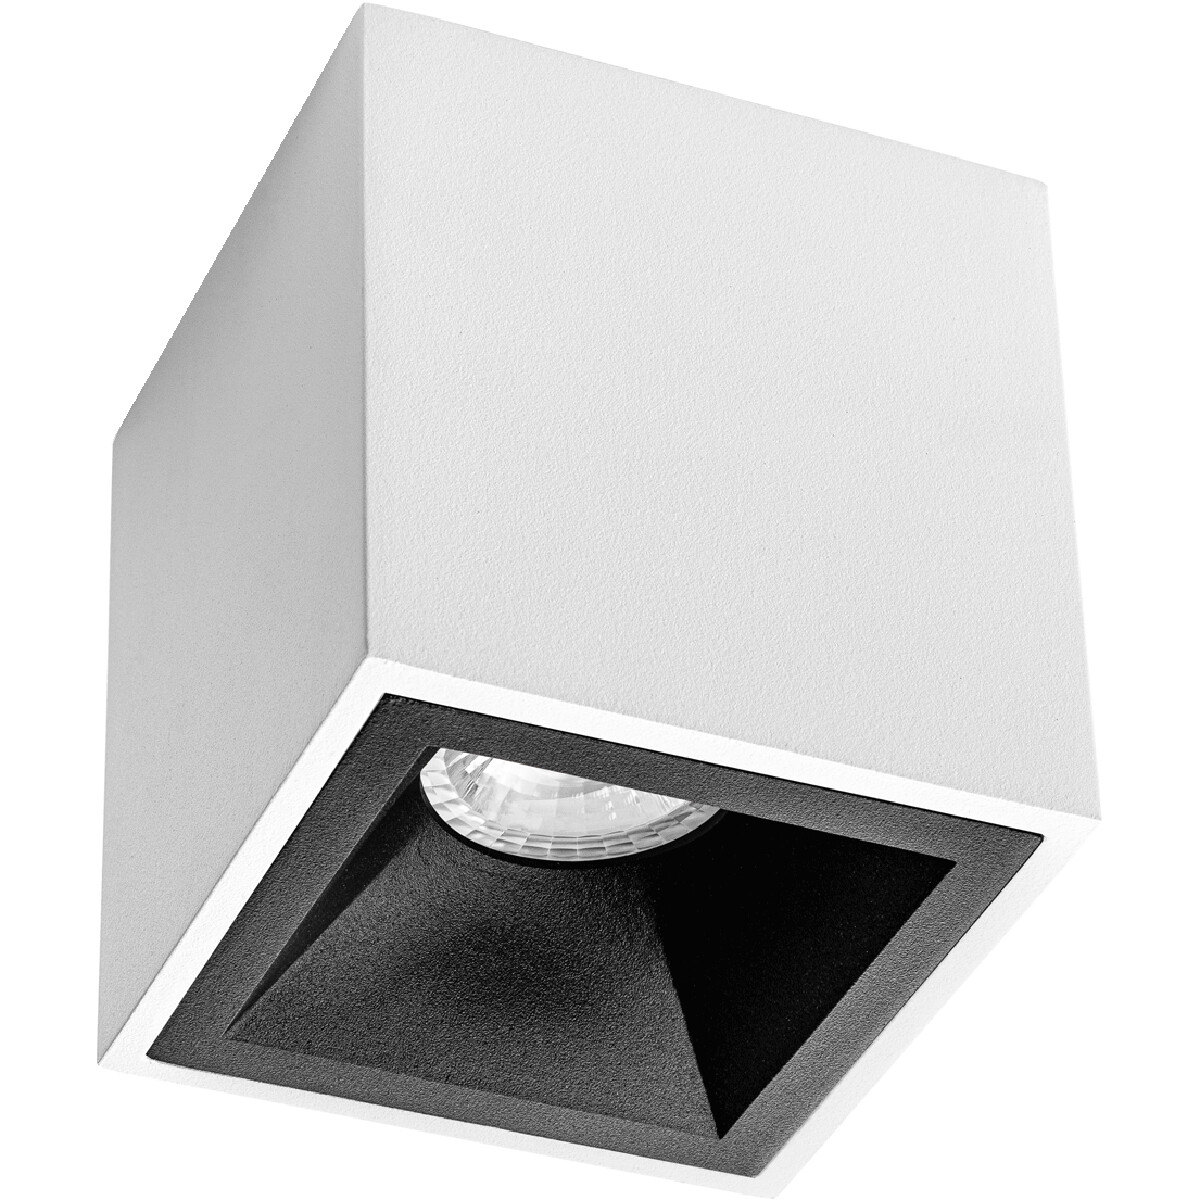 Opbouwspot GU10 - Pragmi Cliron Pro - Opbouw Vierkant - Mat Wit/Zwart - Aluminium - Verdiept - 90mm